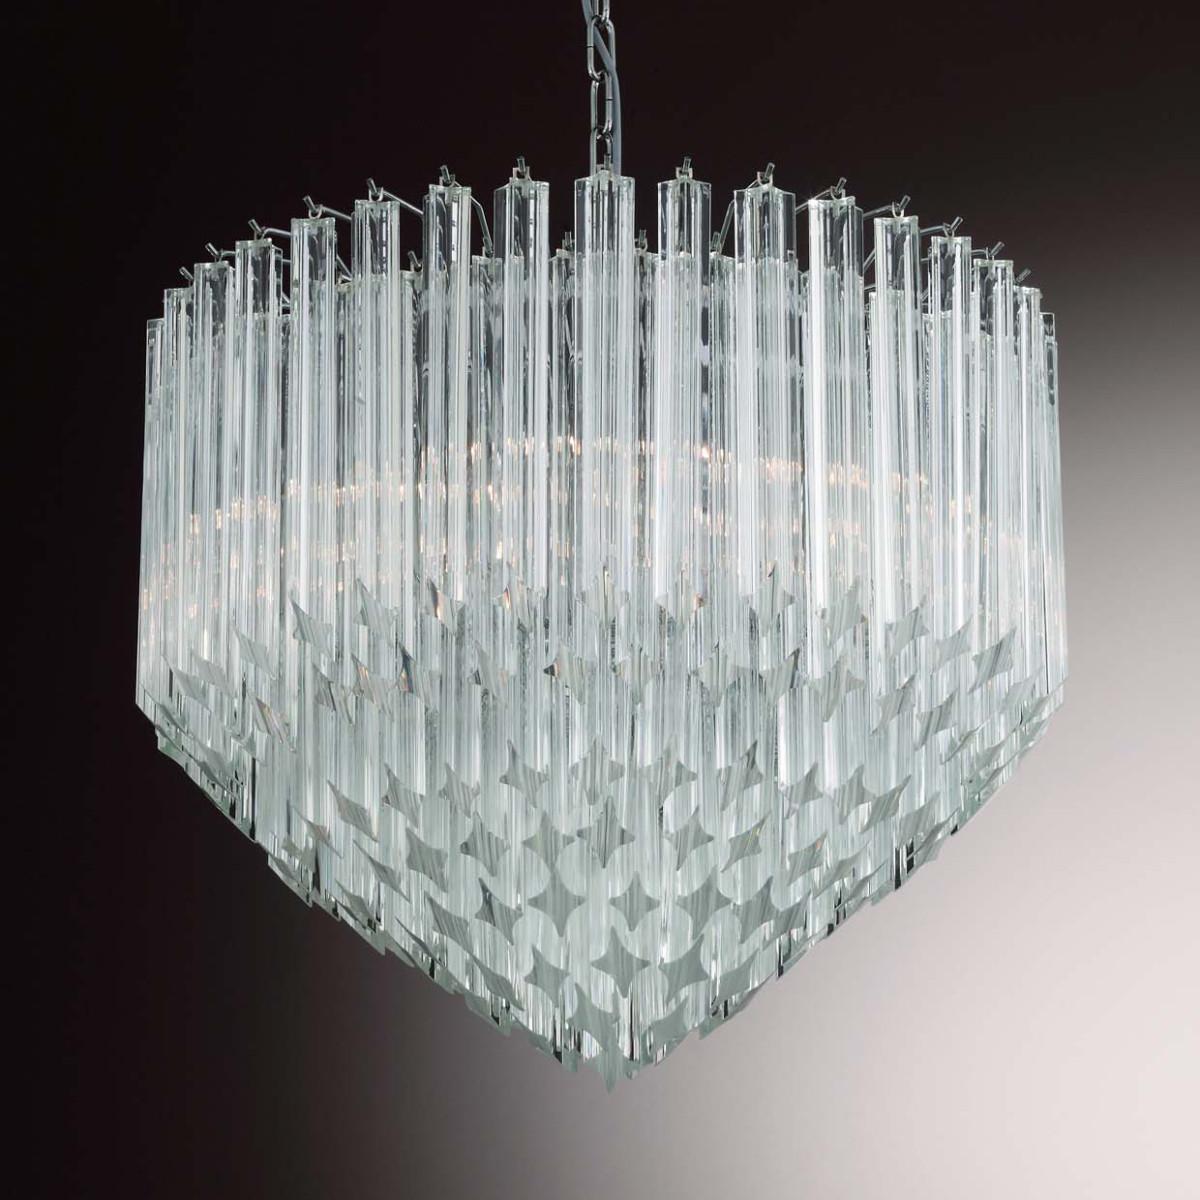 """Harmony"" lampara de cristal de Murano - 6 luces - transparent"